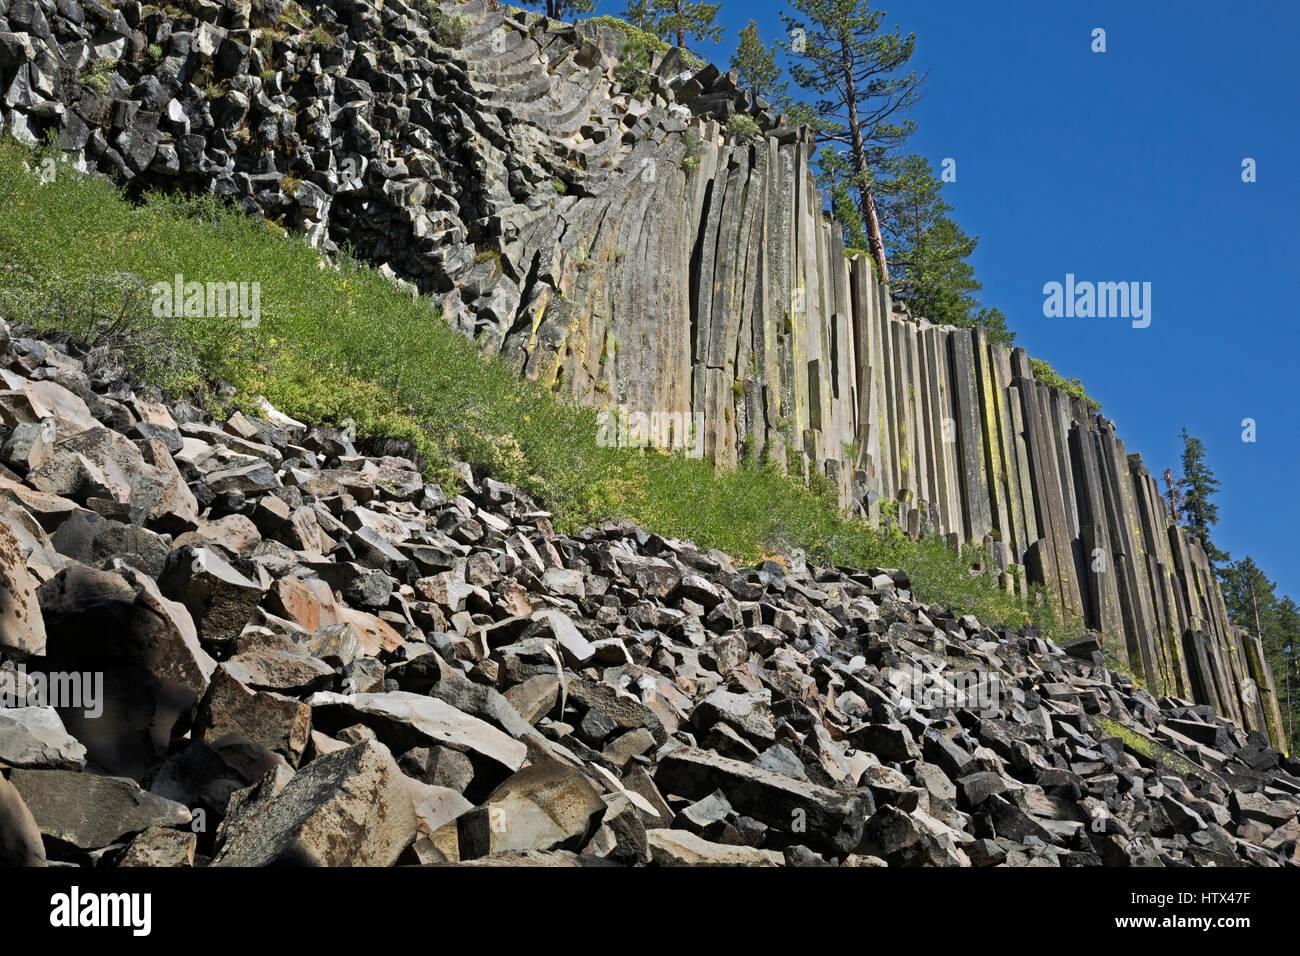 CA03041-00...CALIFORNIA - Wall of columnar basalt at Devils Postpile National Monument. - Stock Image